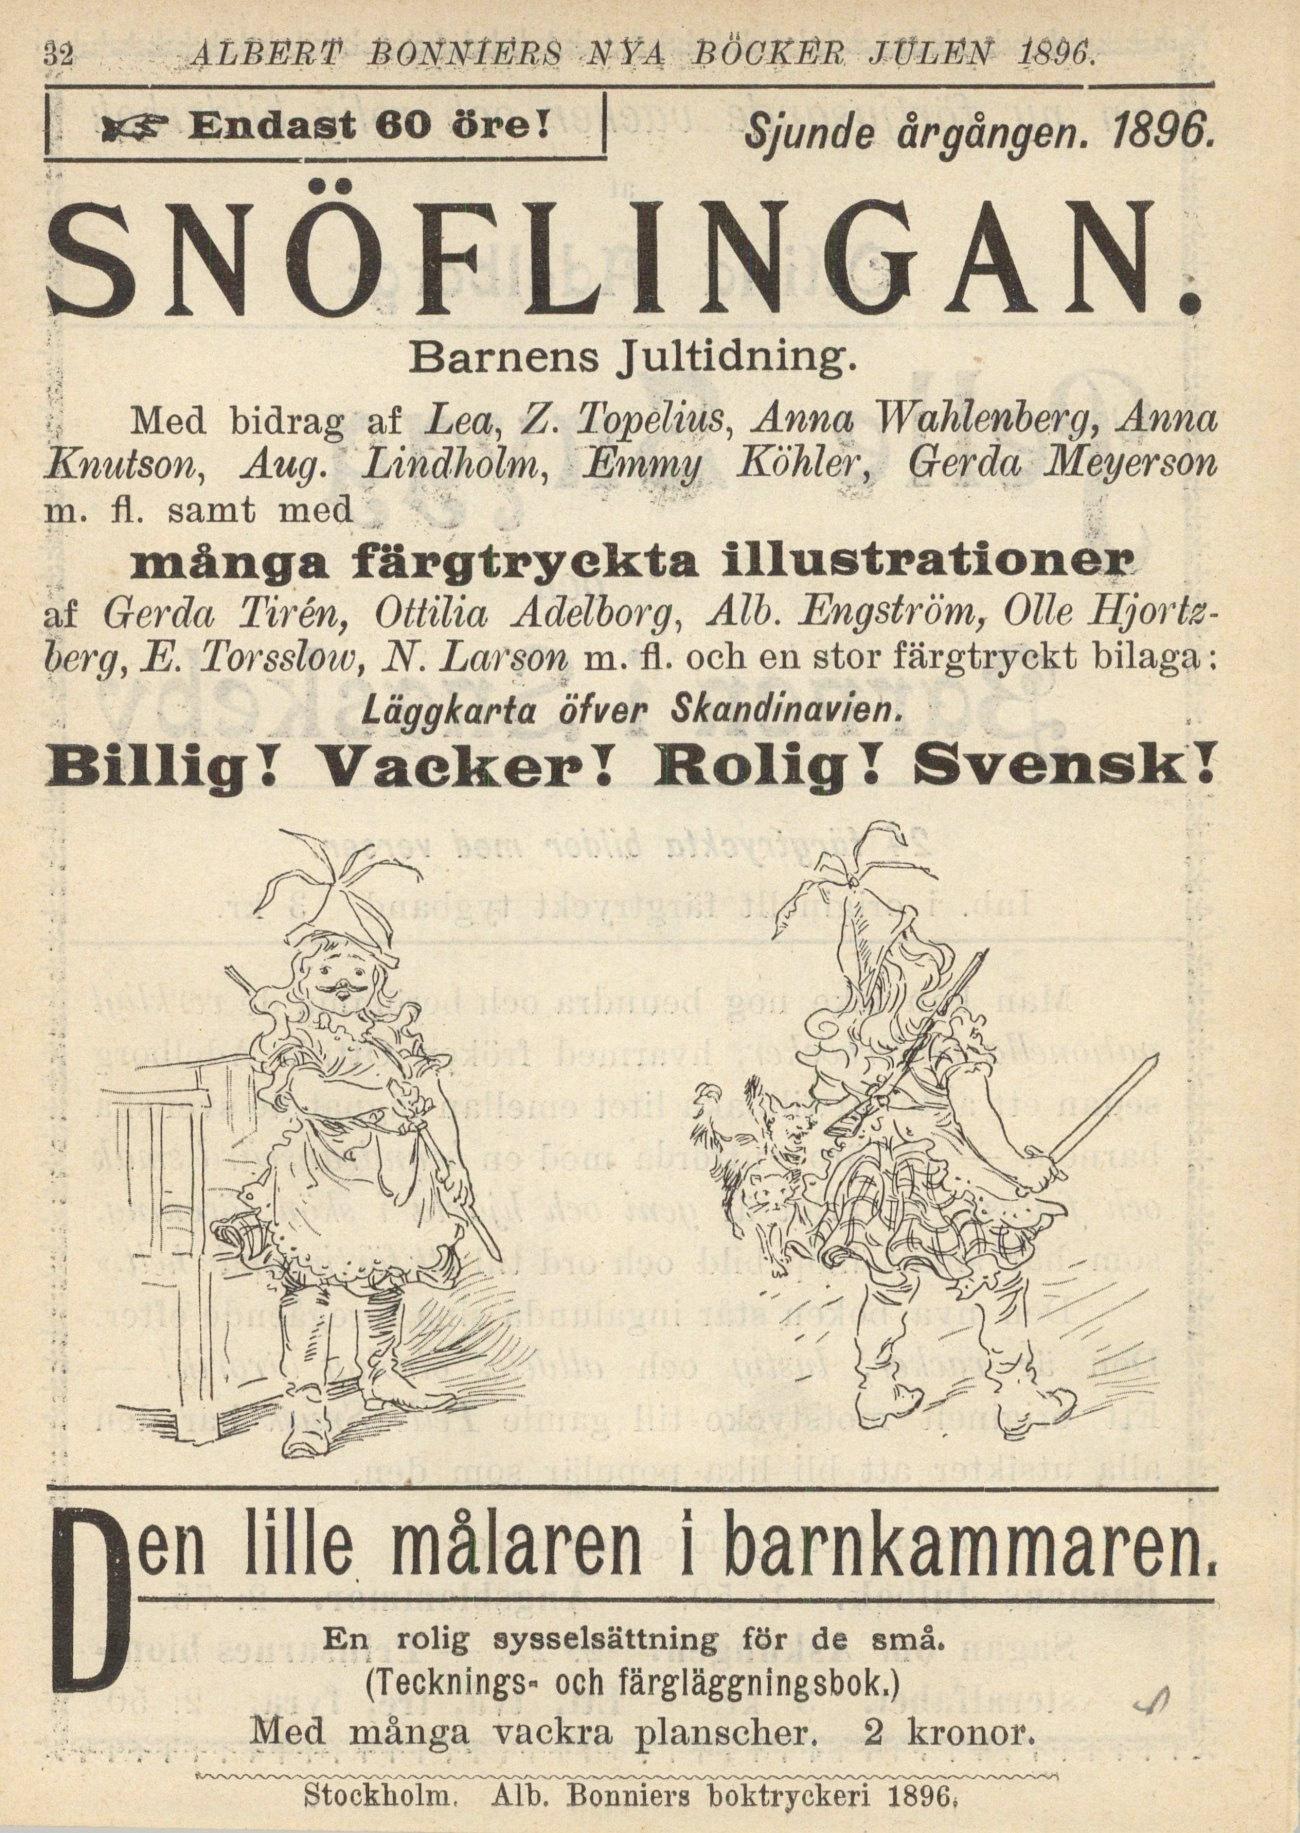 Snöflingan - Pagina pubblicitaria dell'editore - Bonniers förlag reklam - 1896